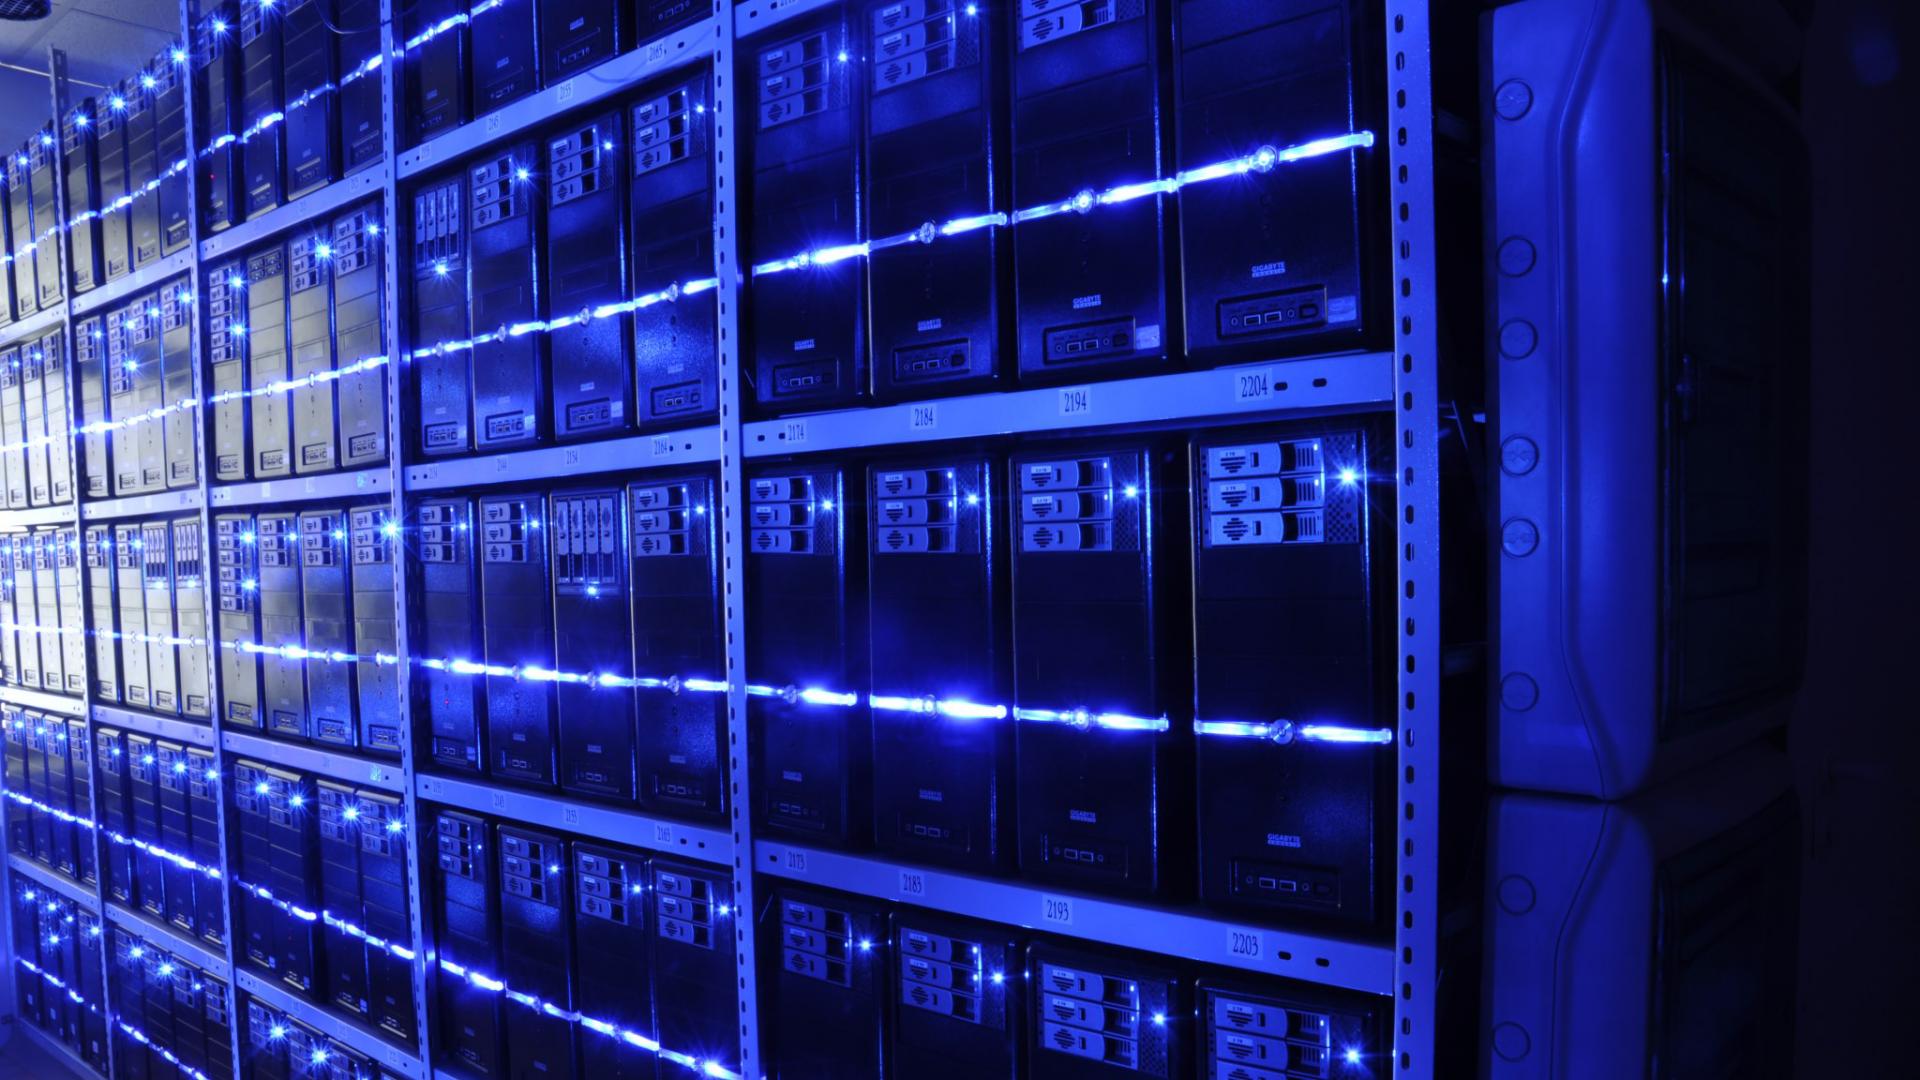 2017 - Data centre